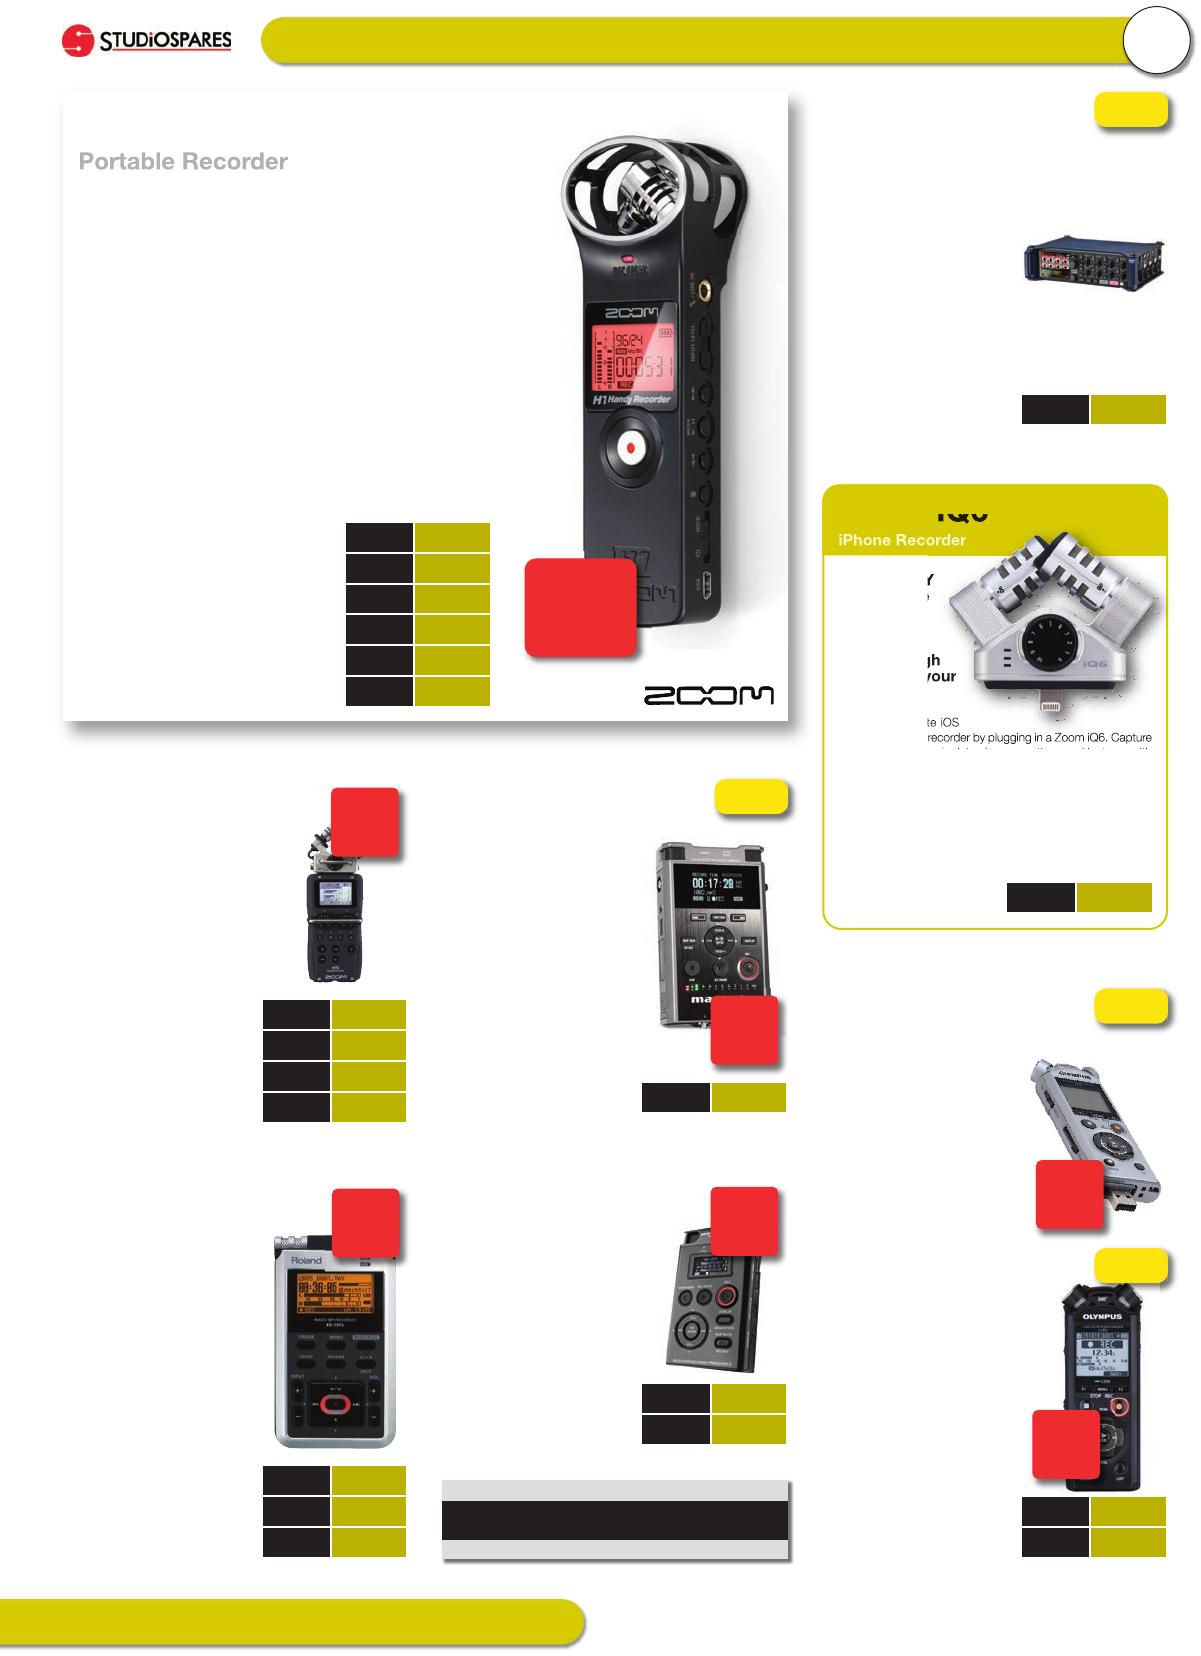 Studiospares Catalogue 2017 Seat Post Suspension Zoom Ready Size 316 Portable Recorders 5